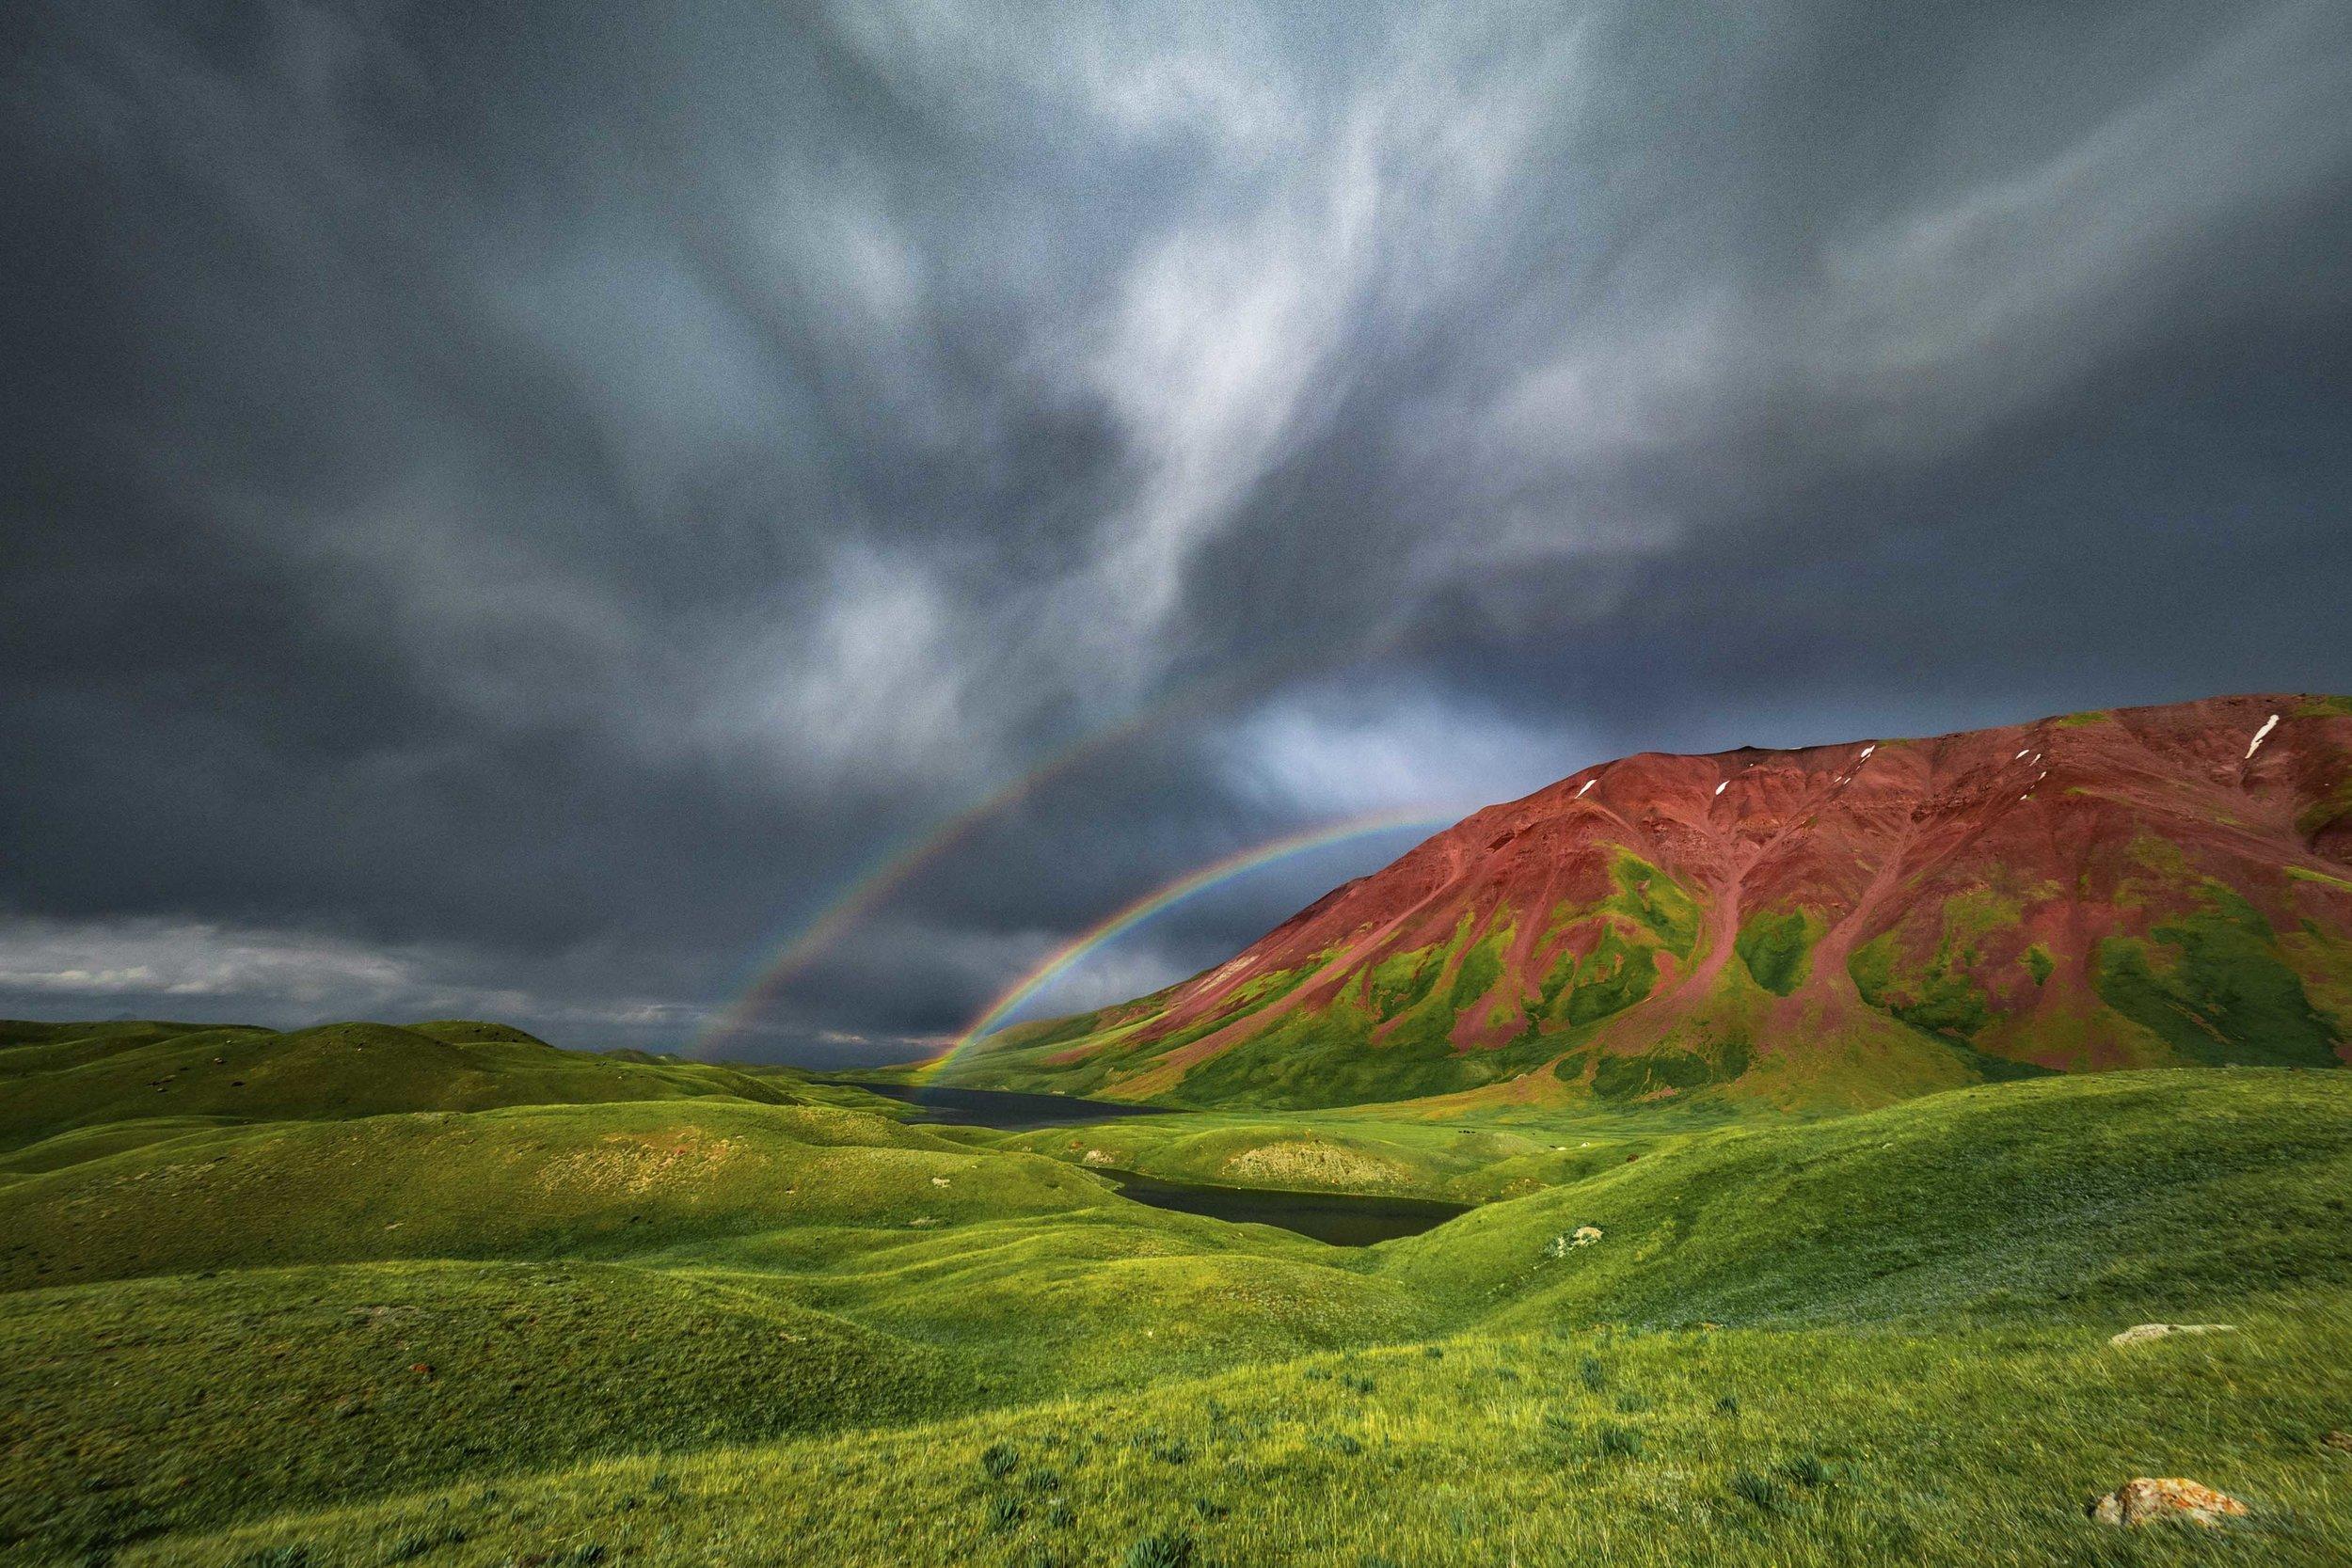 Heaven On Earth - Turpar Kul, Kyrgyzstan. Photo: Kel Morales.